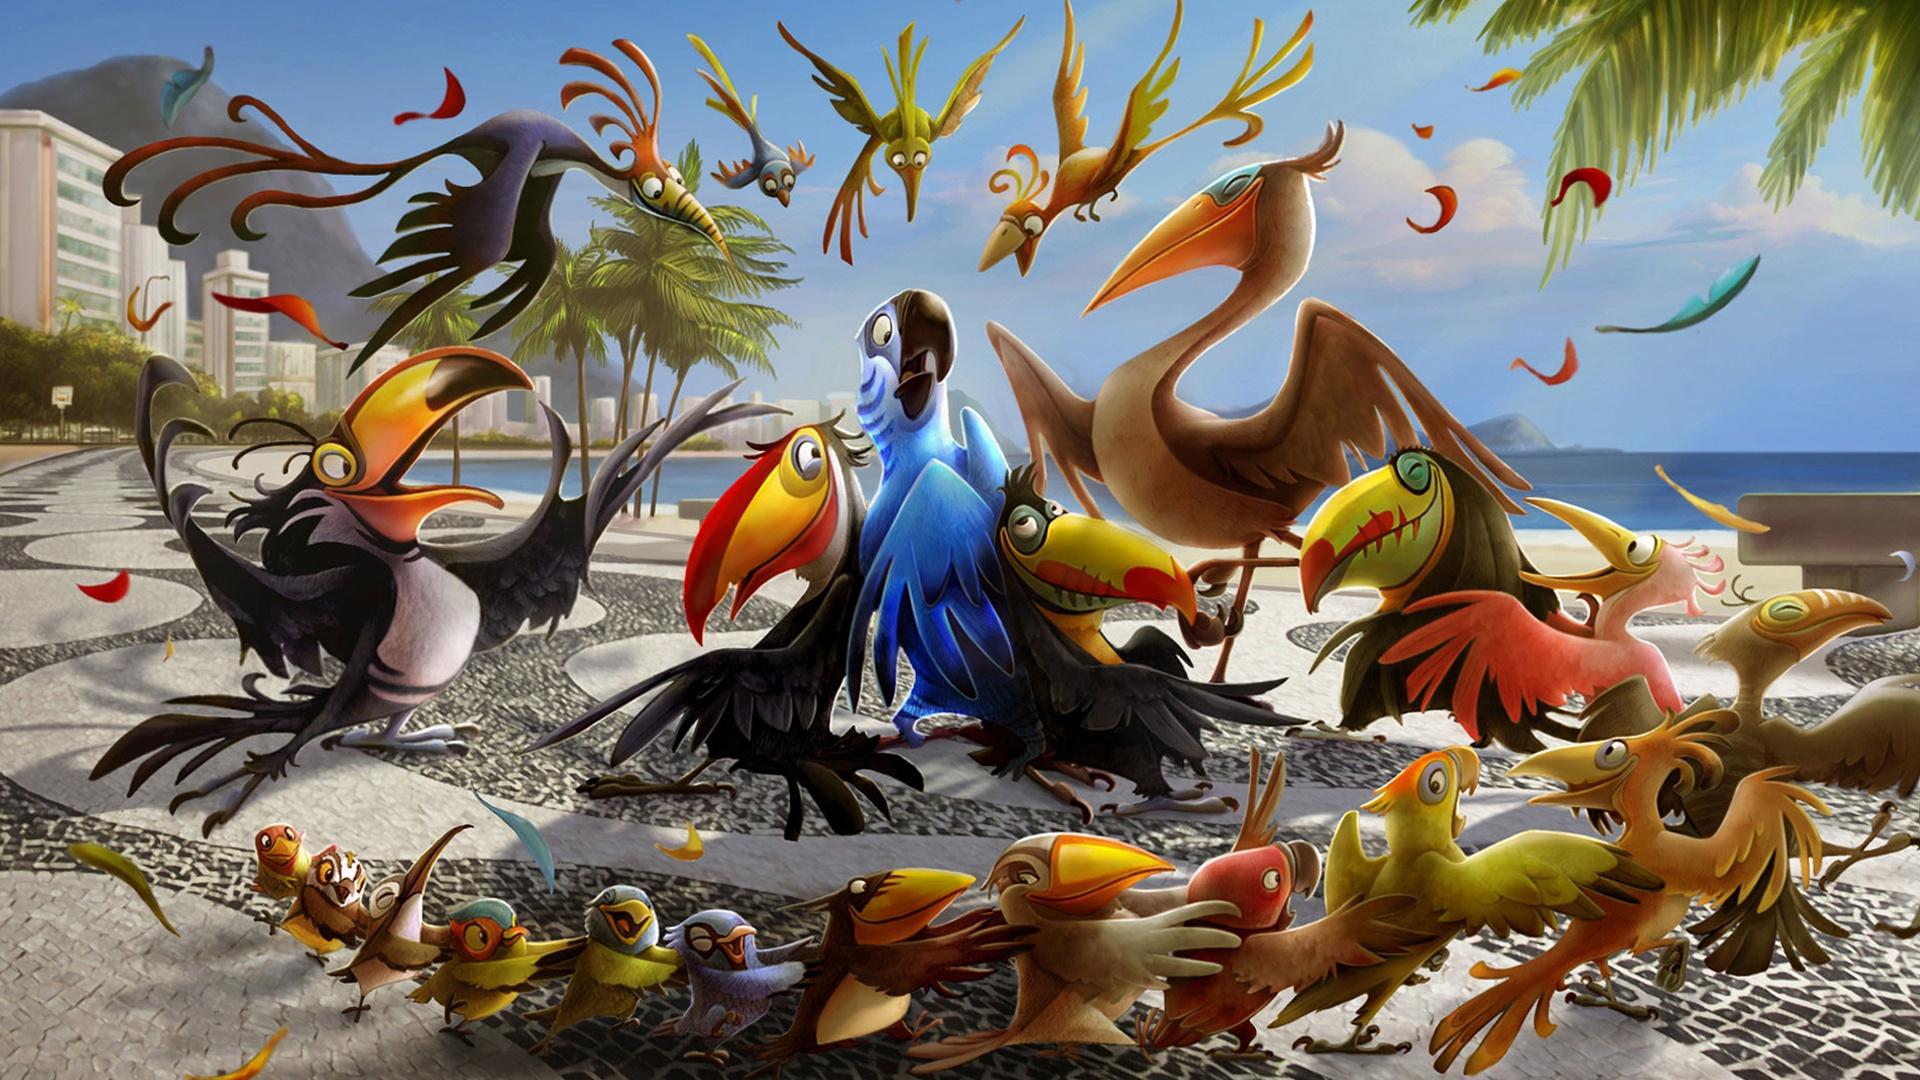 Rio 2 Hd Wallpaper Background Image 1920x1080 Id 812735